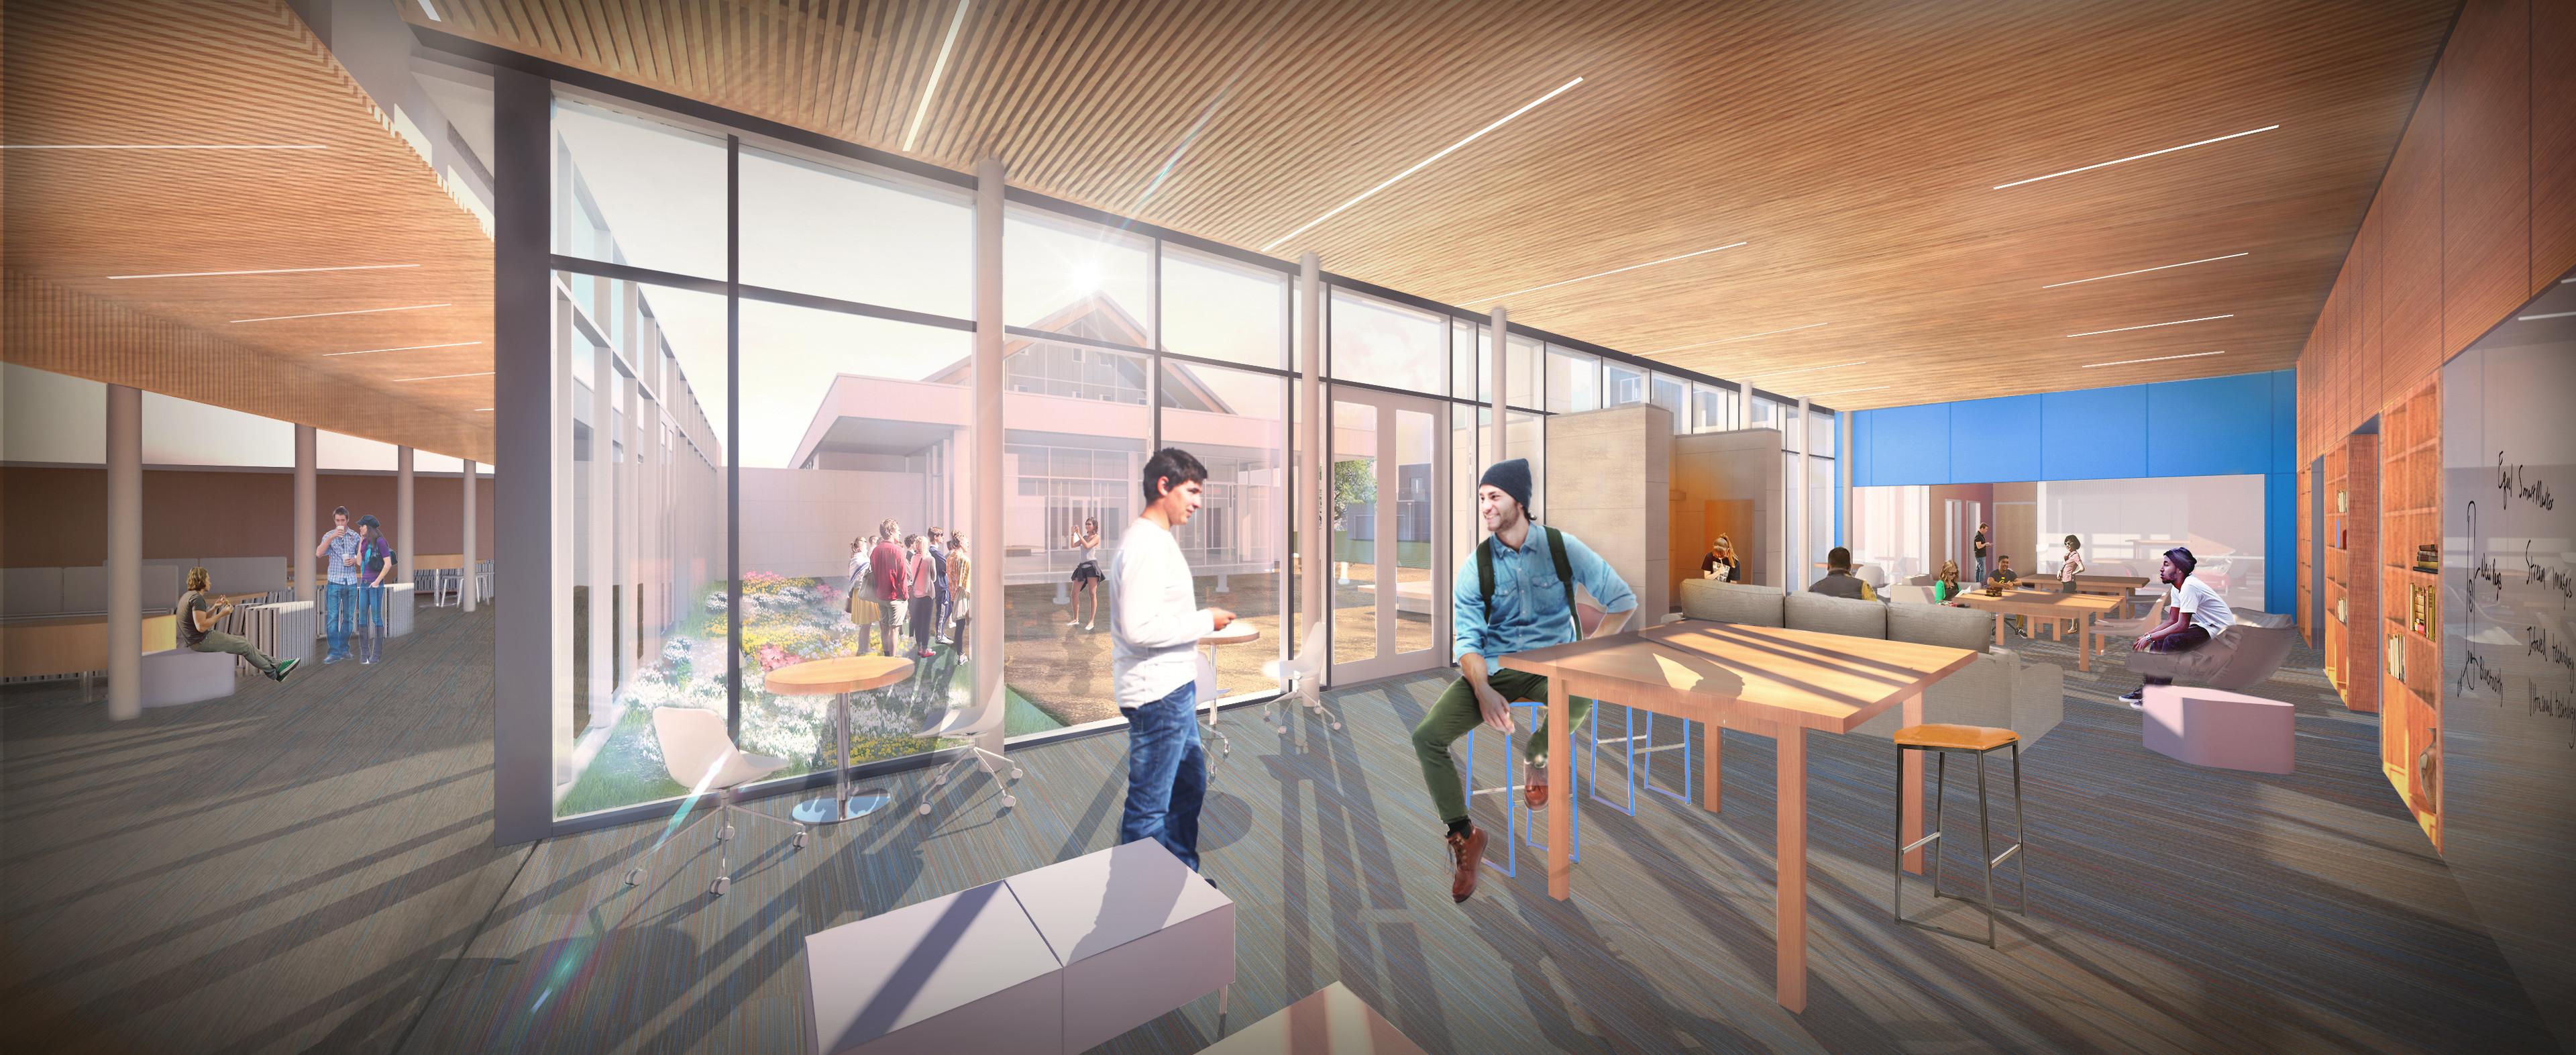 Interior Library Concept - St. John Paul II Newman Center (Omaha, NE)